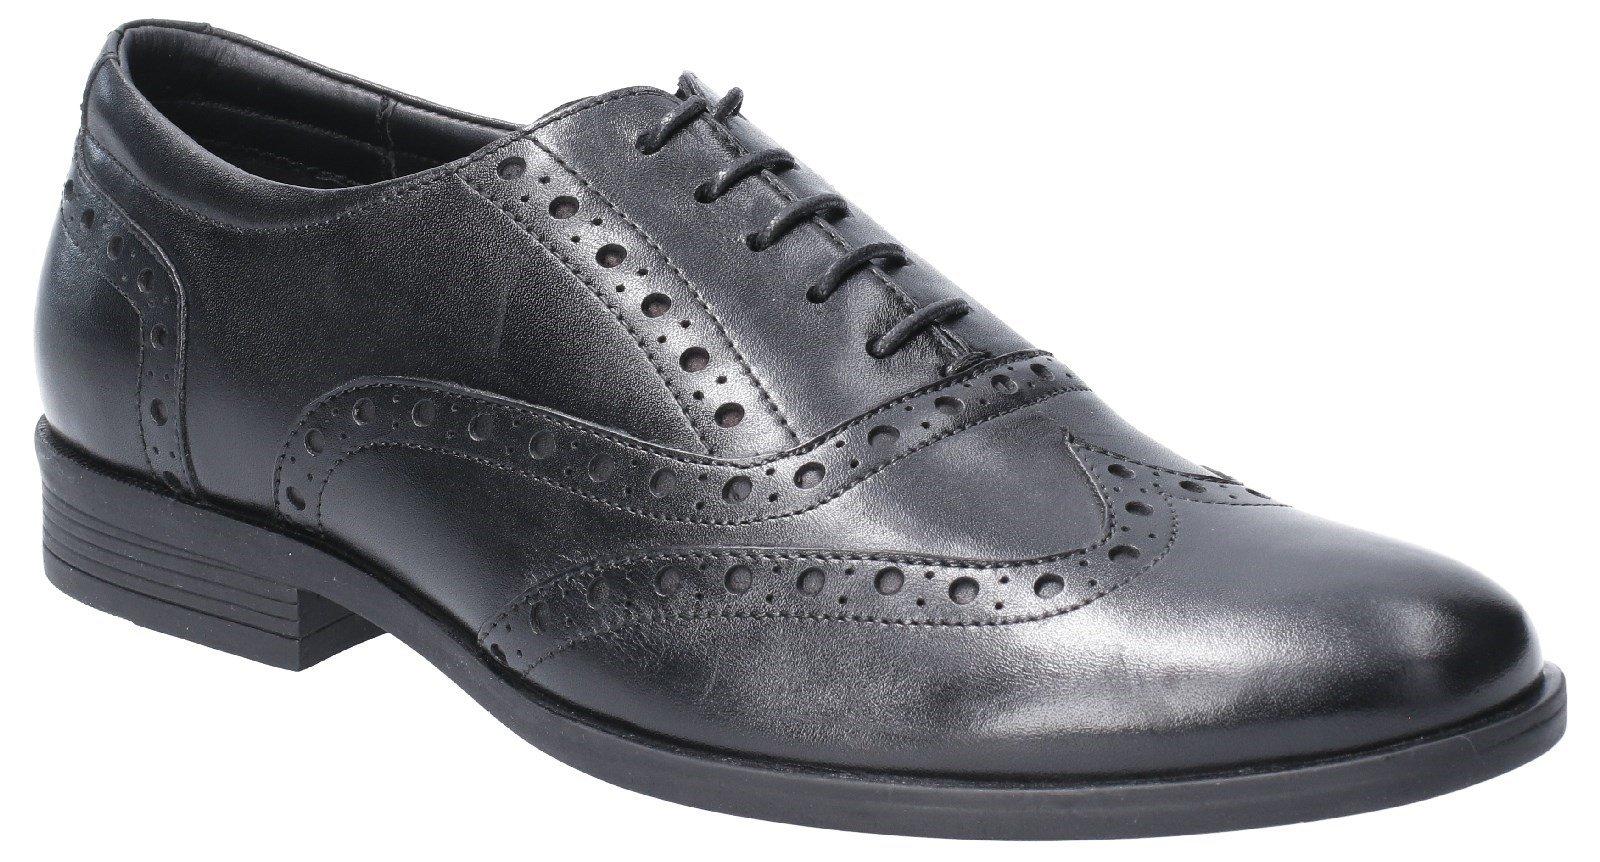 Hush Puppies Men's Oaken Brogue Shoe Various Colours 29188 - Black 6